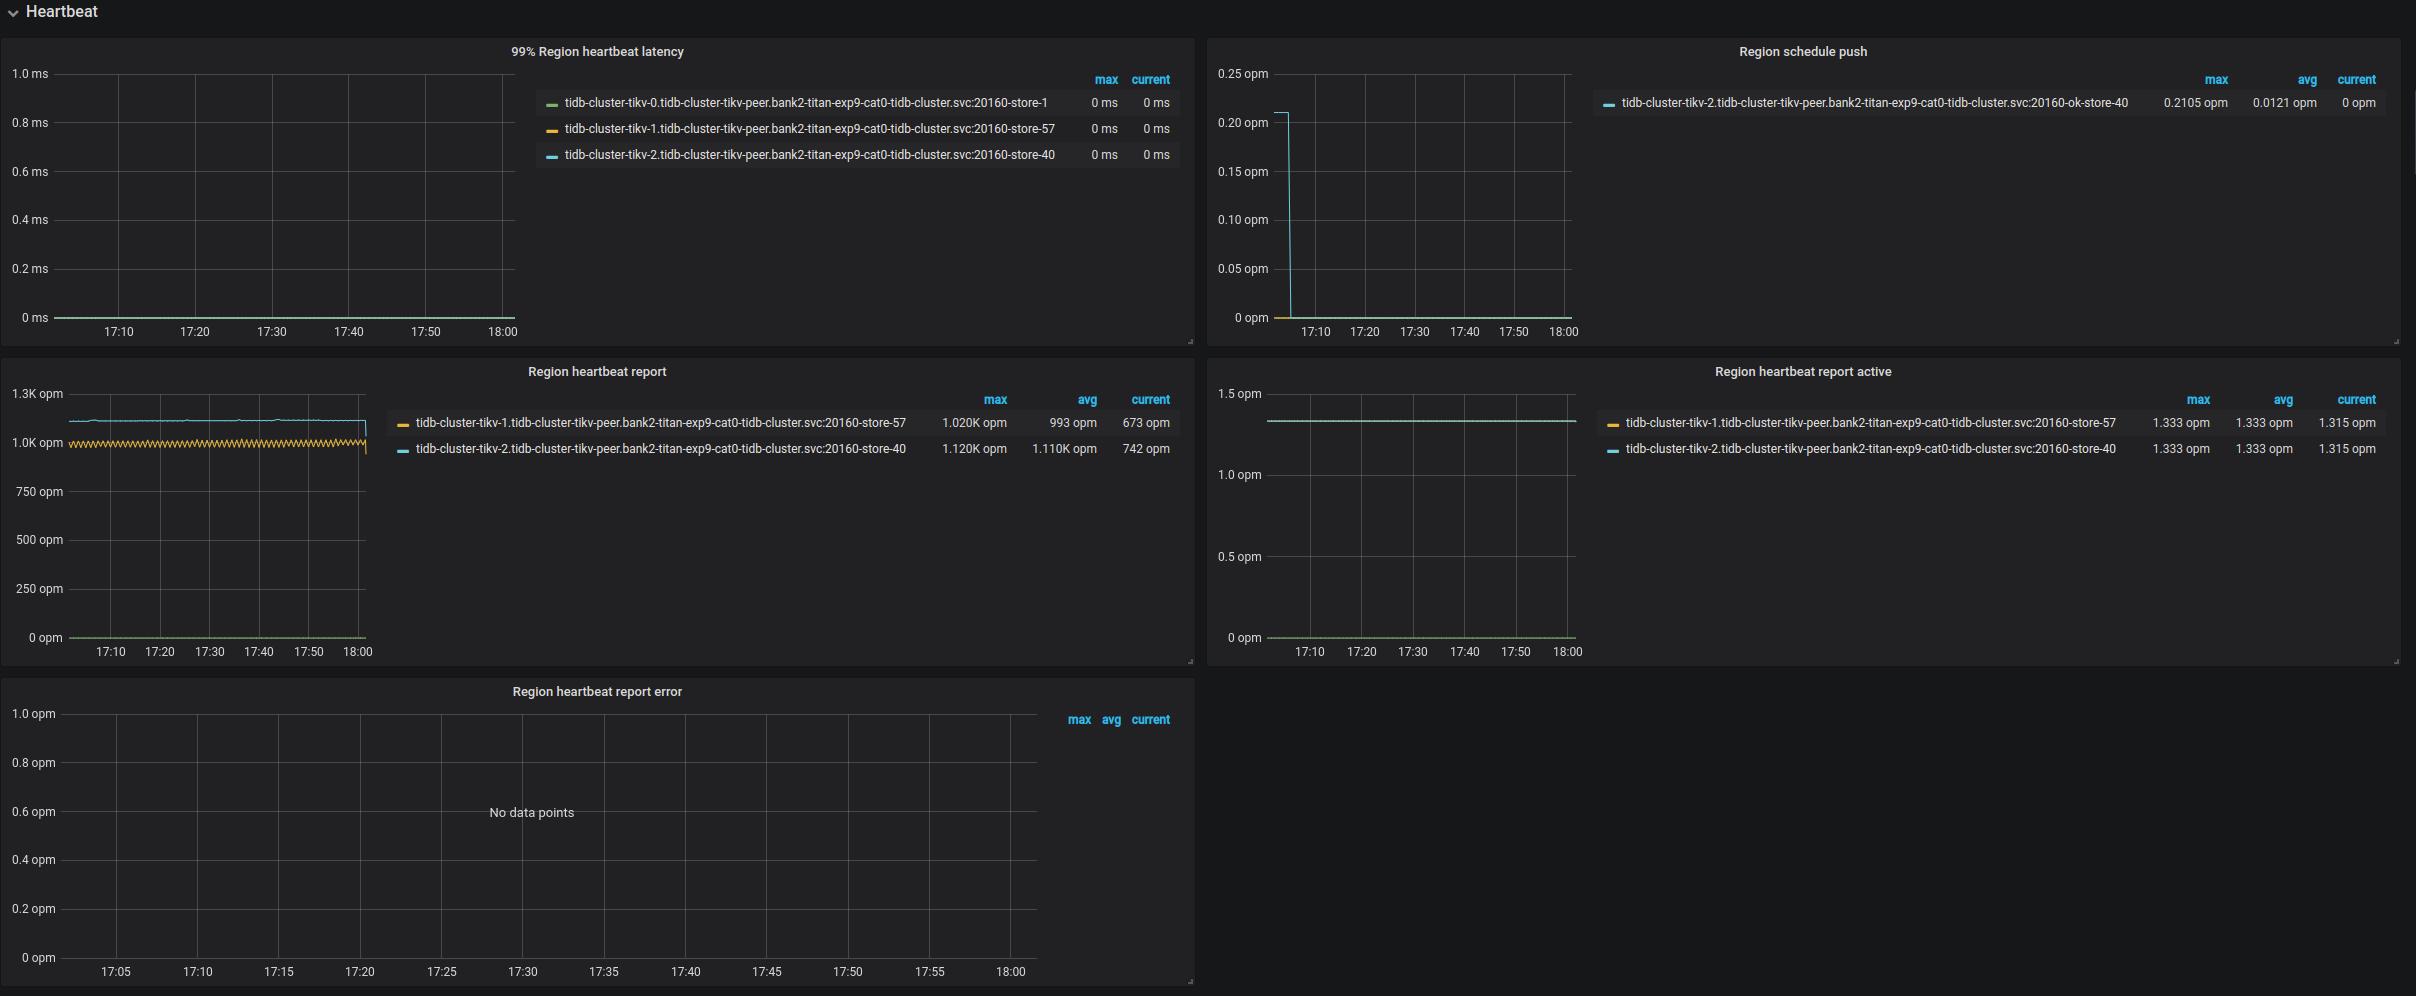 PD Dashboard - Heartbeat metrics